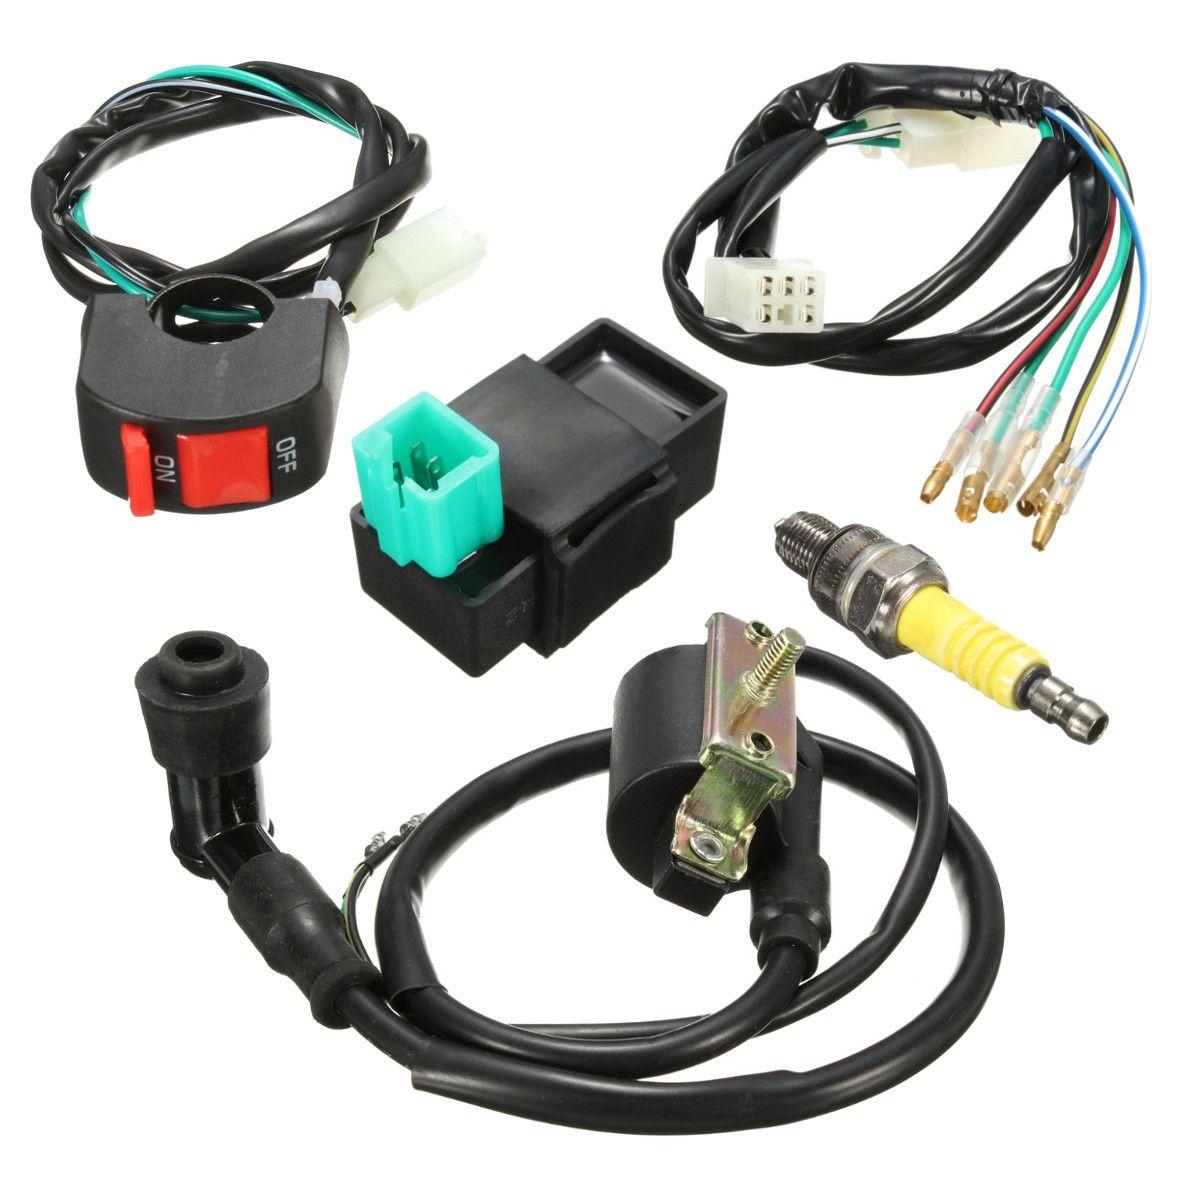 2a1294215cebb125ab41eb4df7b8532c wiring loom kill switch coil cdi spark plug kit for 110cc 125cc auto electrical wiring diagrams at honlapkeszites.co